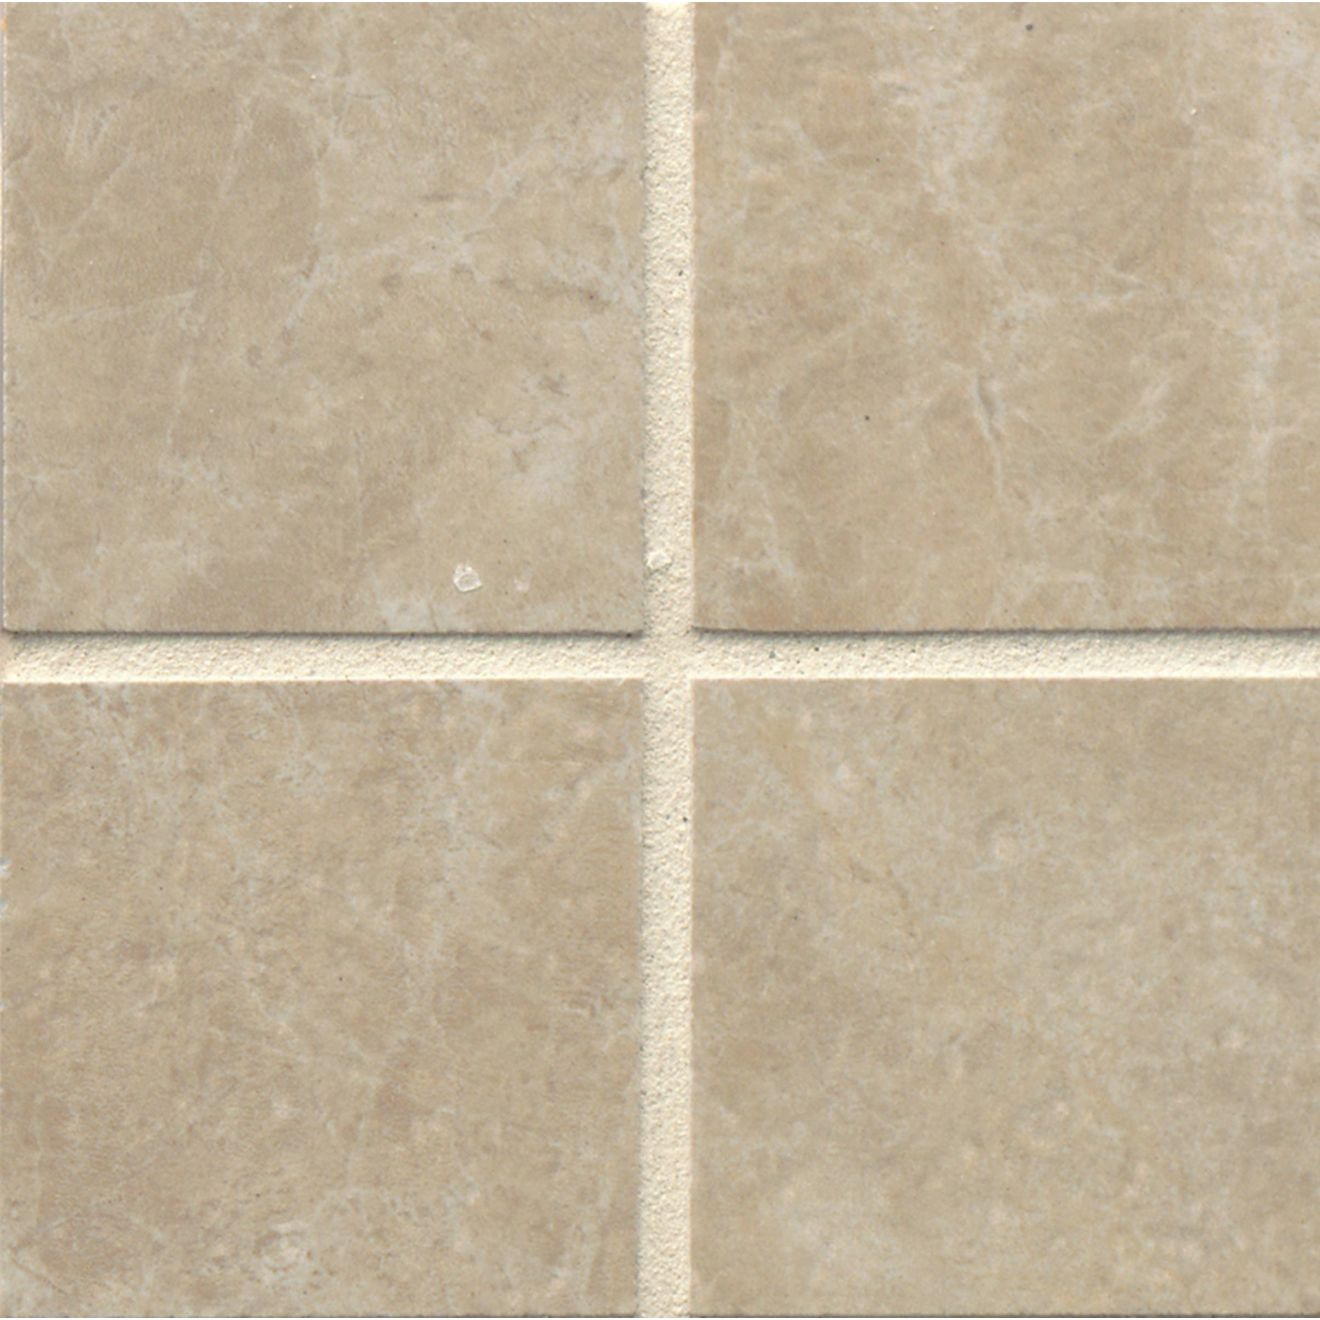 "Indiana Stone 6"" x 6"" Floor & Wall Tile in Beige"